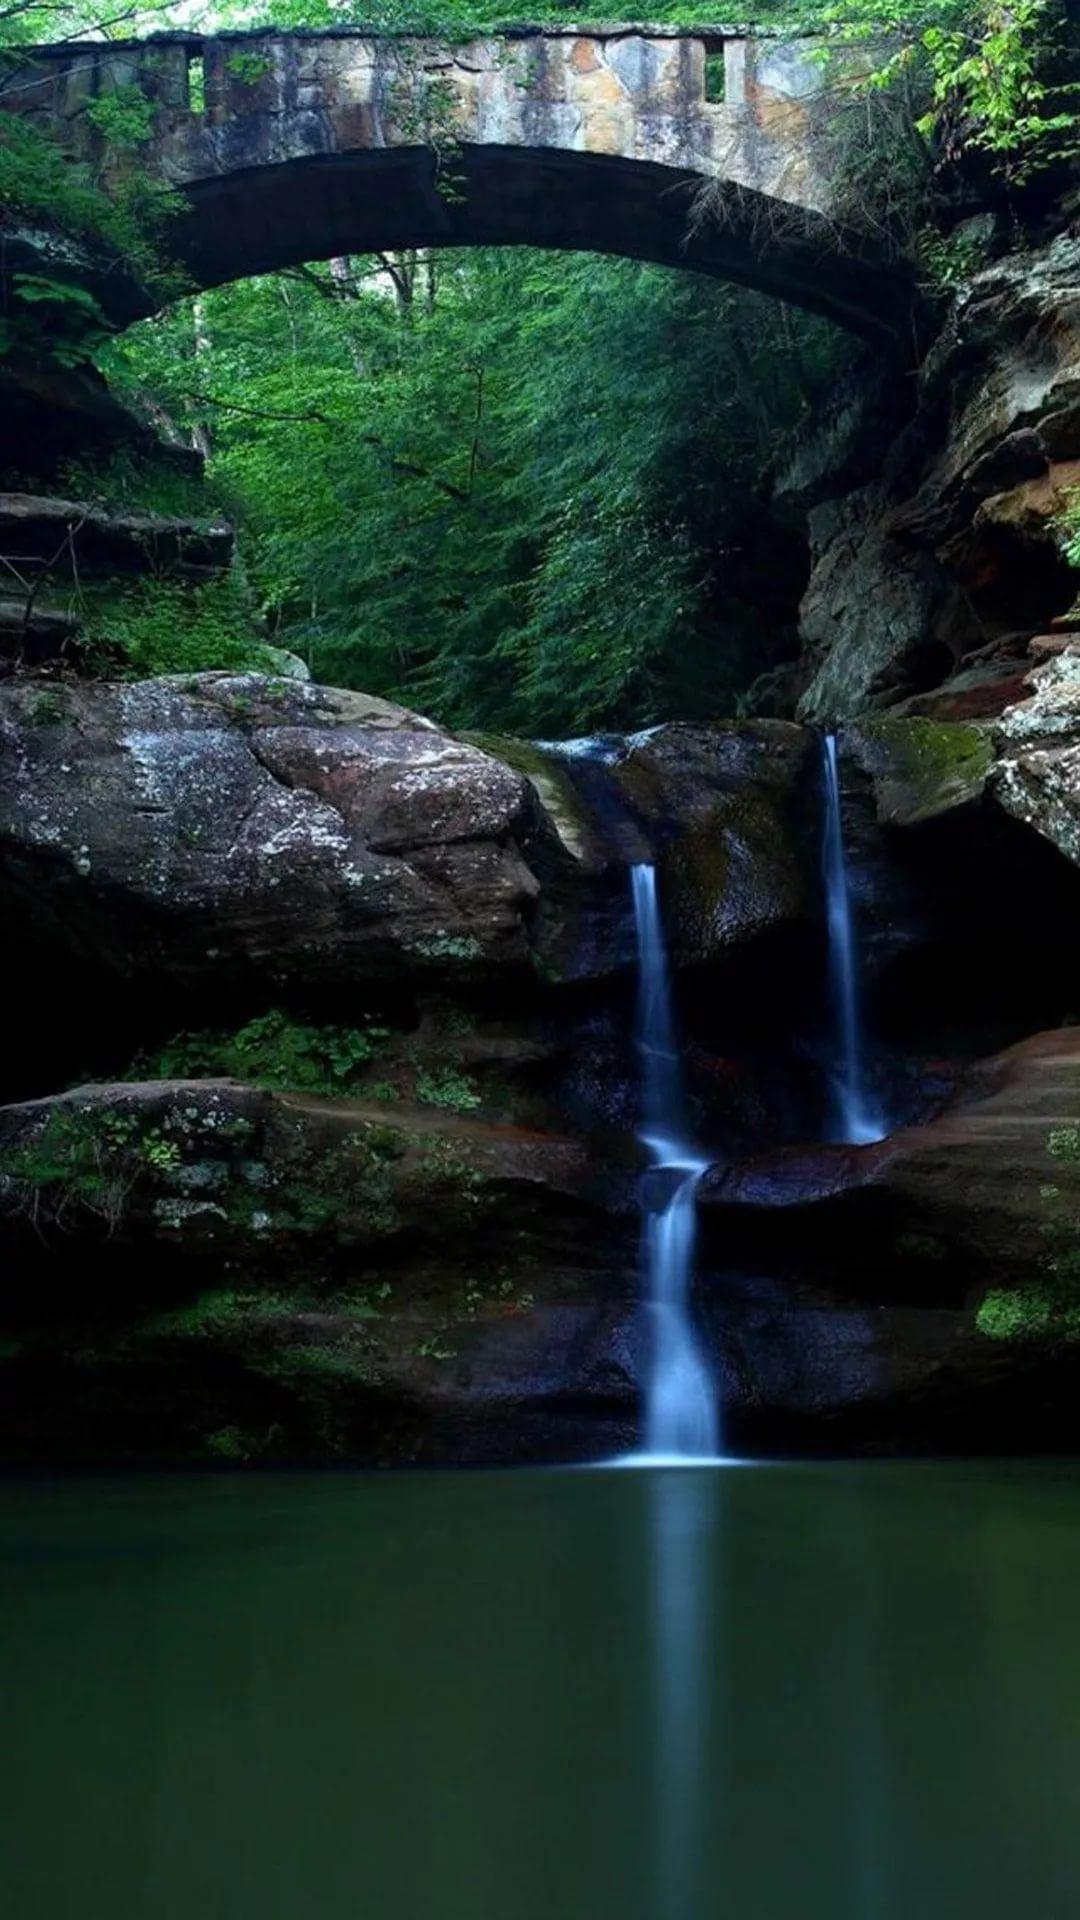 Nature Hd iPhone hd wallpaper